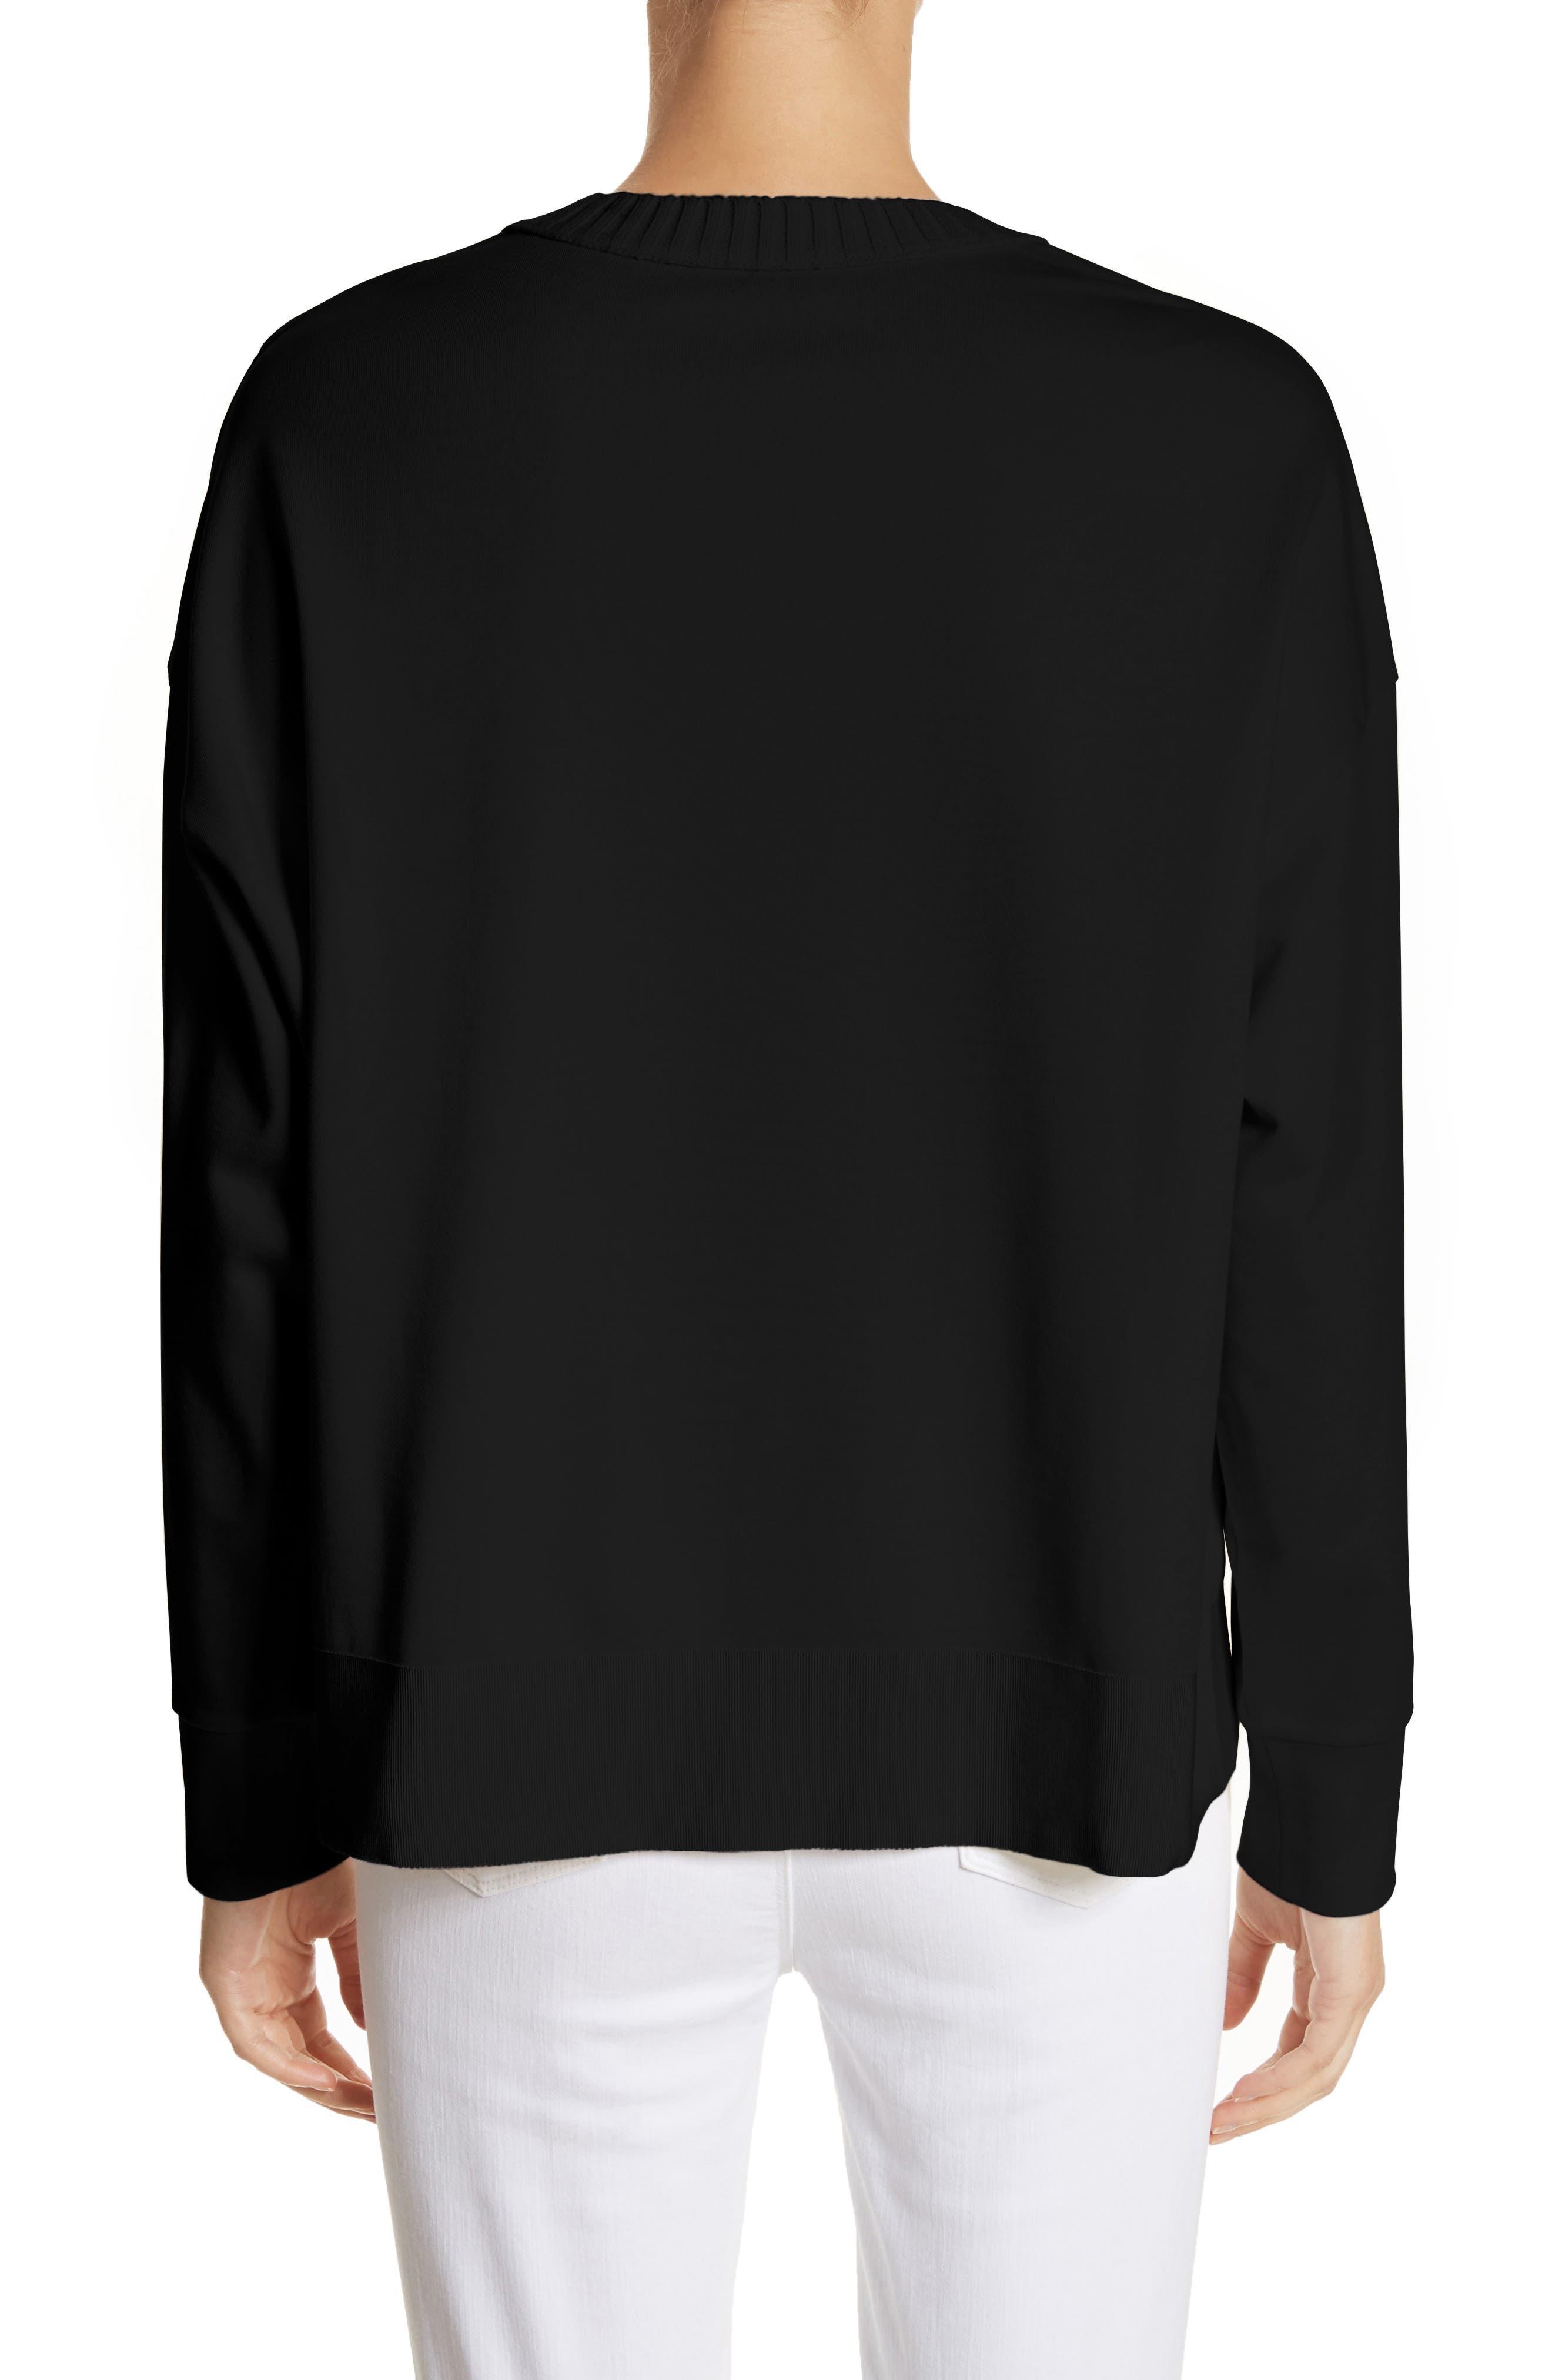 Cotton Sweatshirt,                             Alternate thumbnail 2, color,                             Black